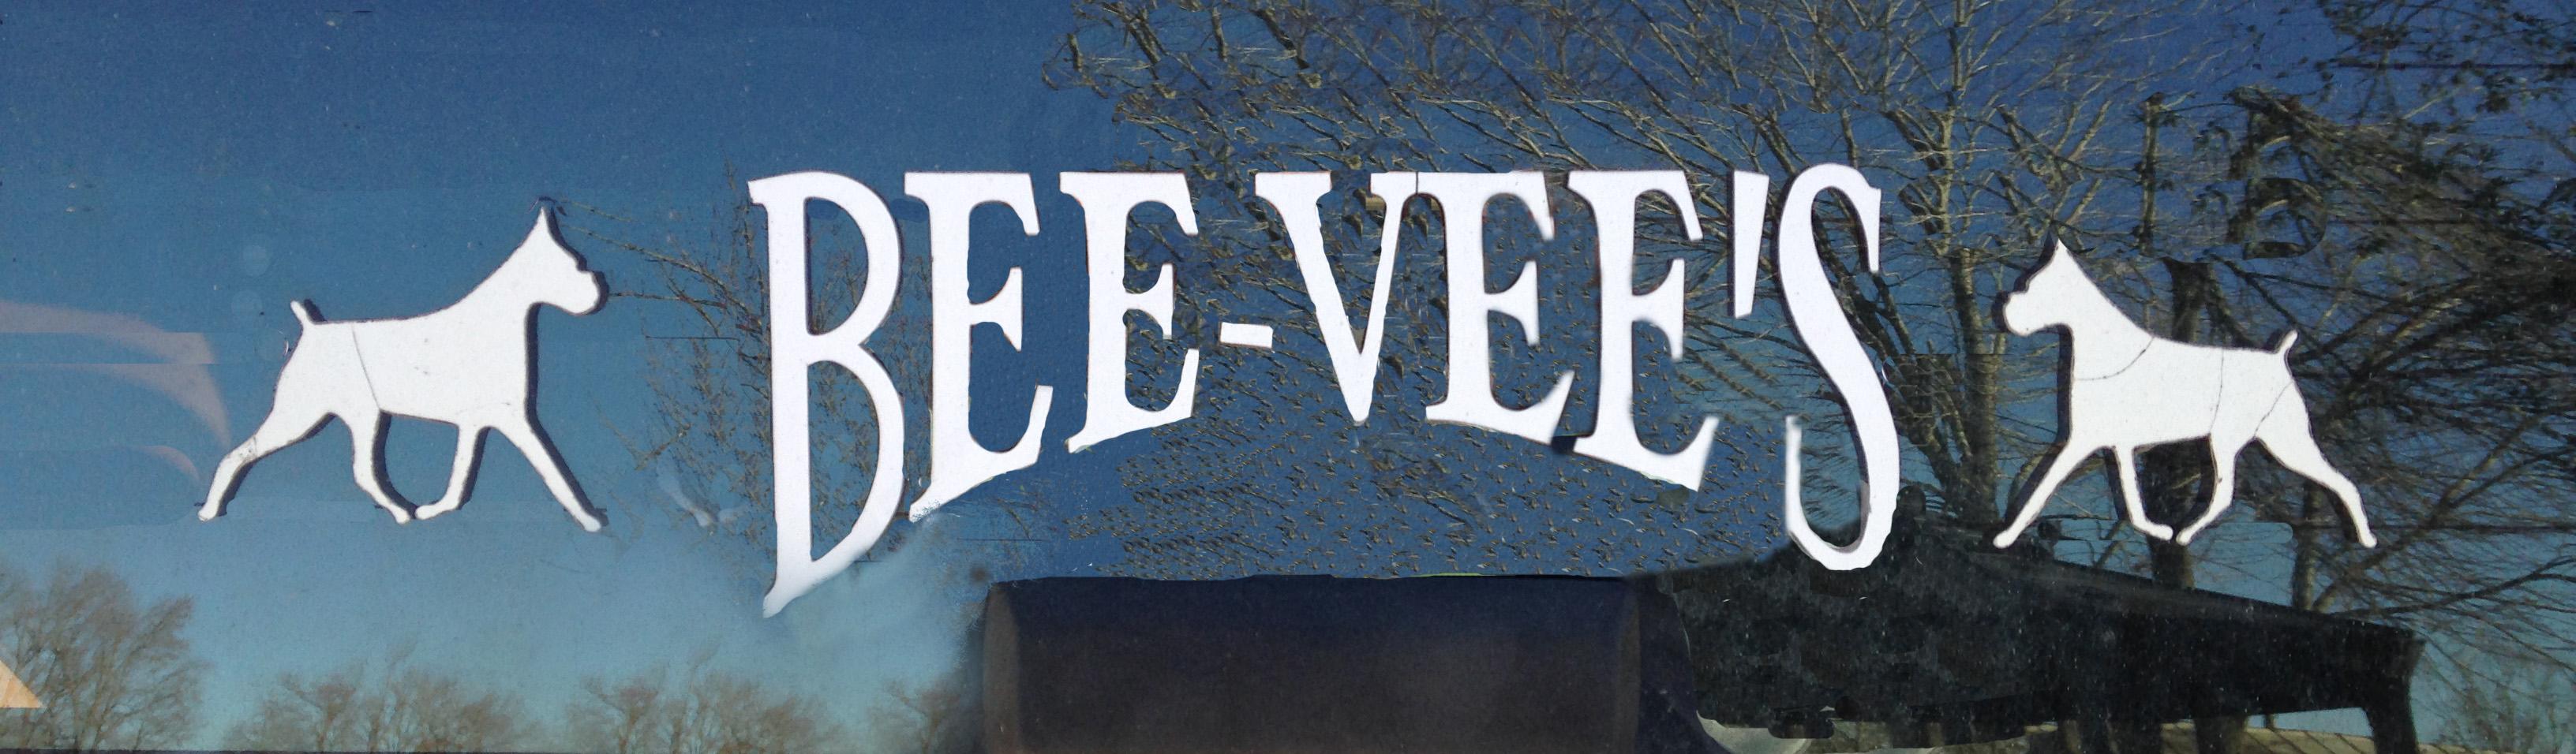 BEEVEE's